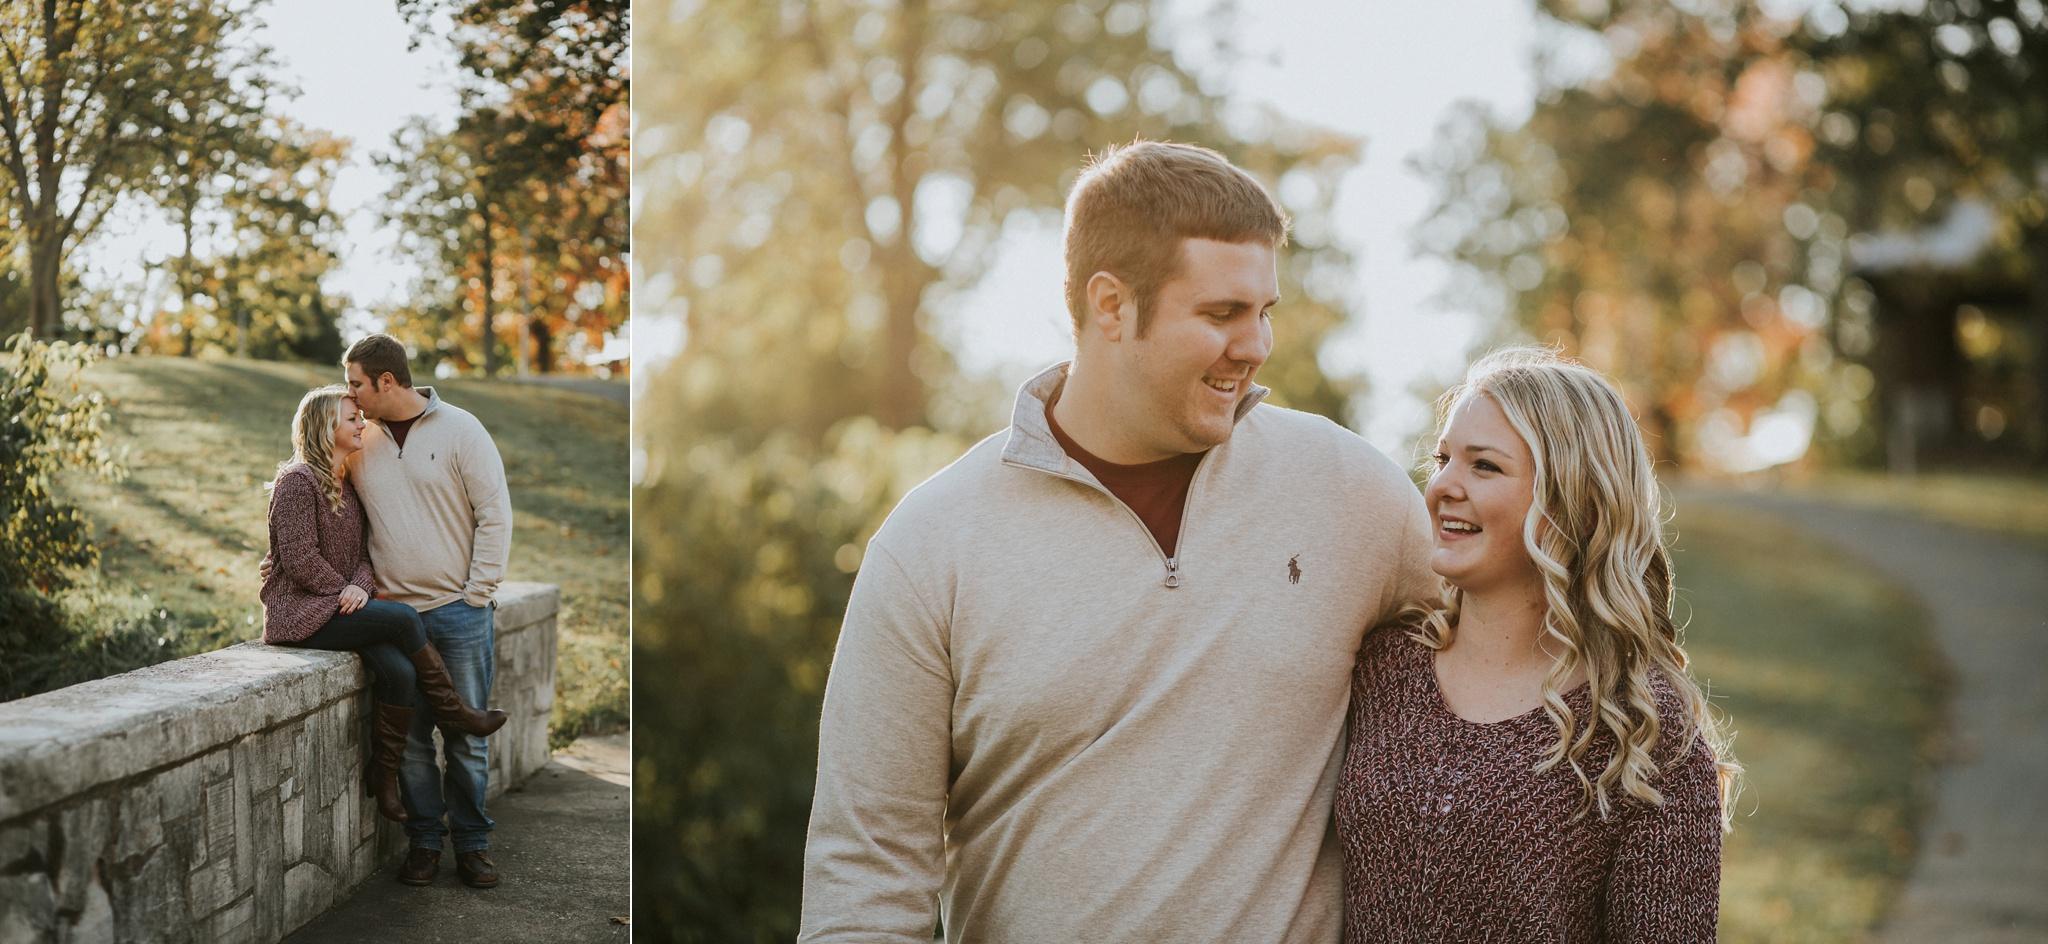 Bosse-Field-Engagement-Photos-Evansville_0016.jpg